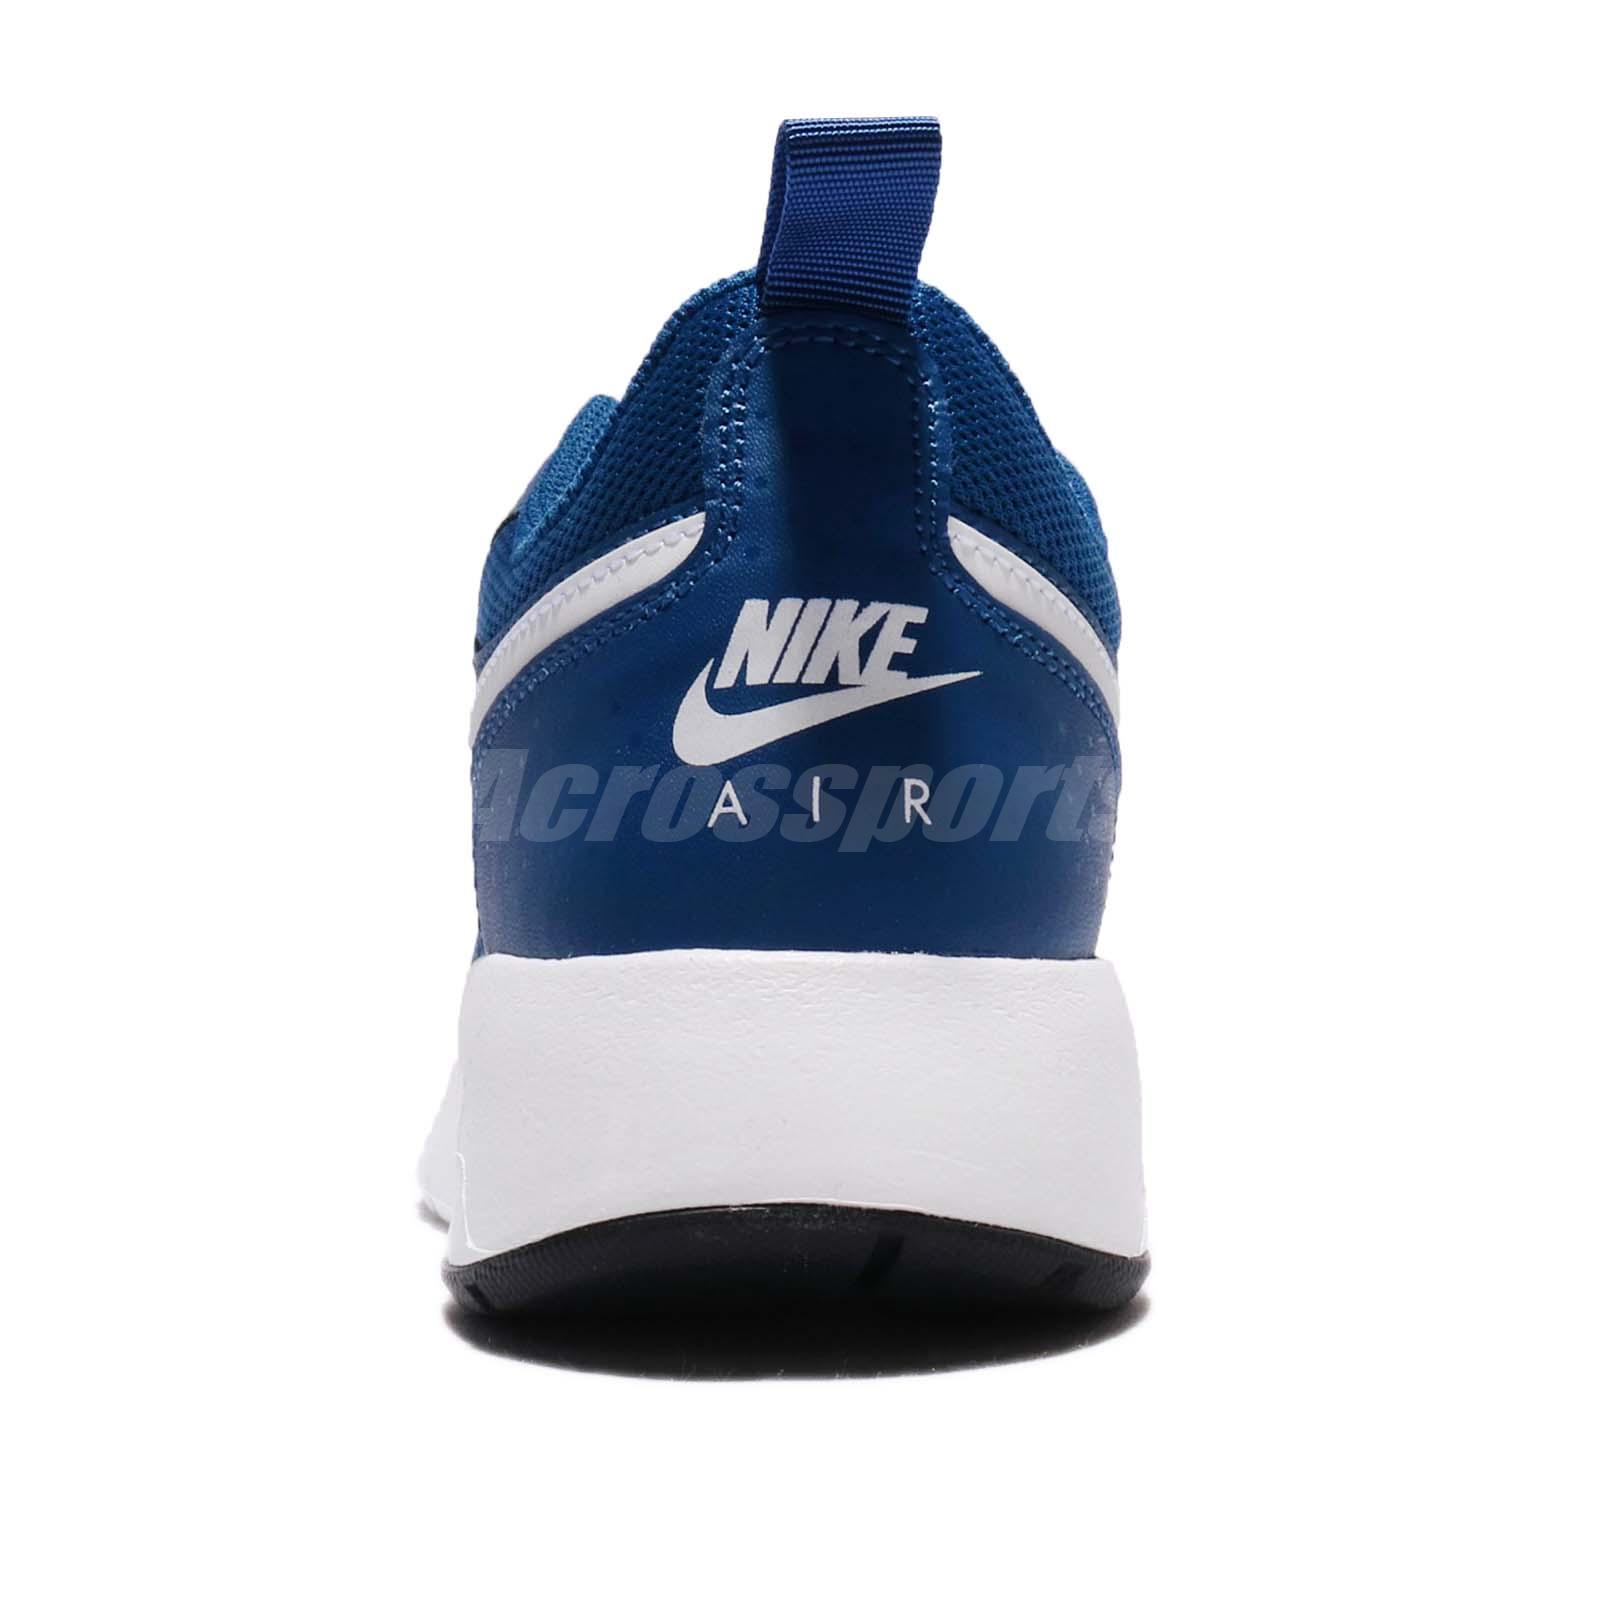 best service bd0a3 e0273 Nike Air Max Vision GS Gym Blue White Kids Women Running Shoe Sneaker 917857 -402